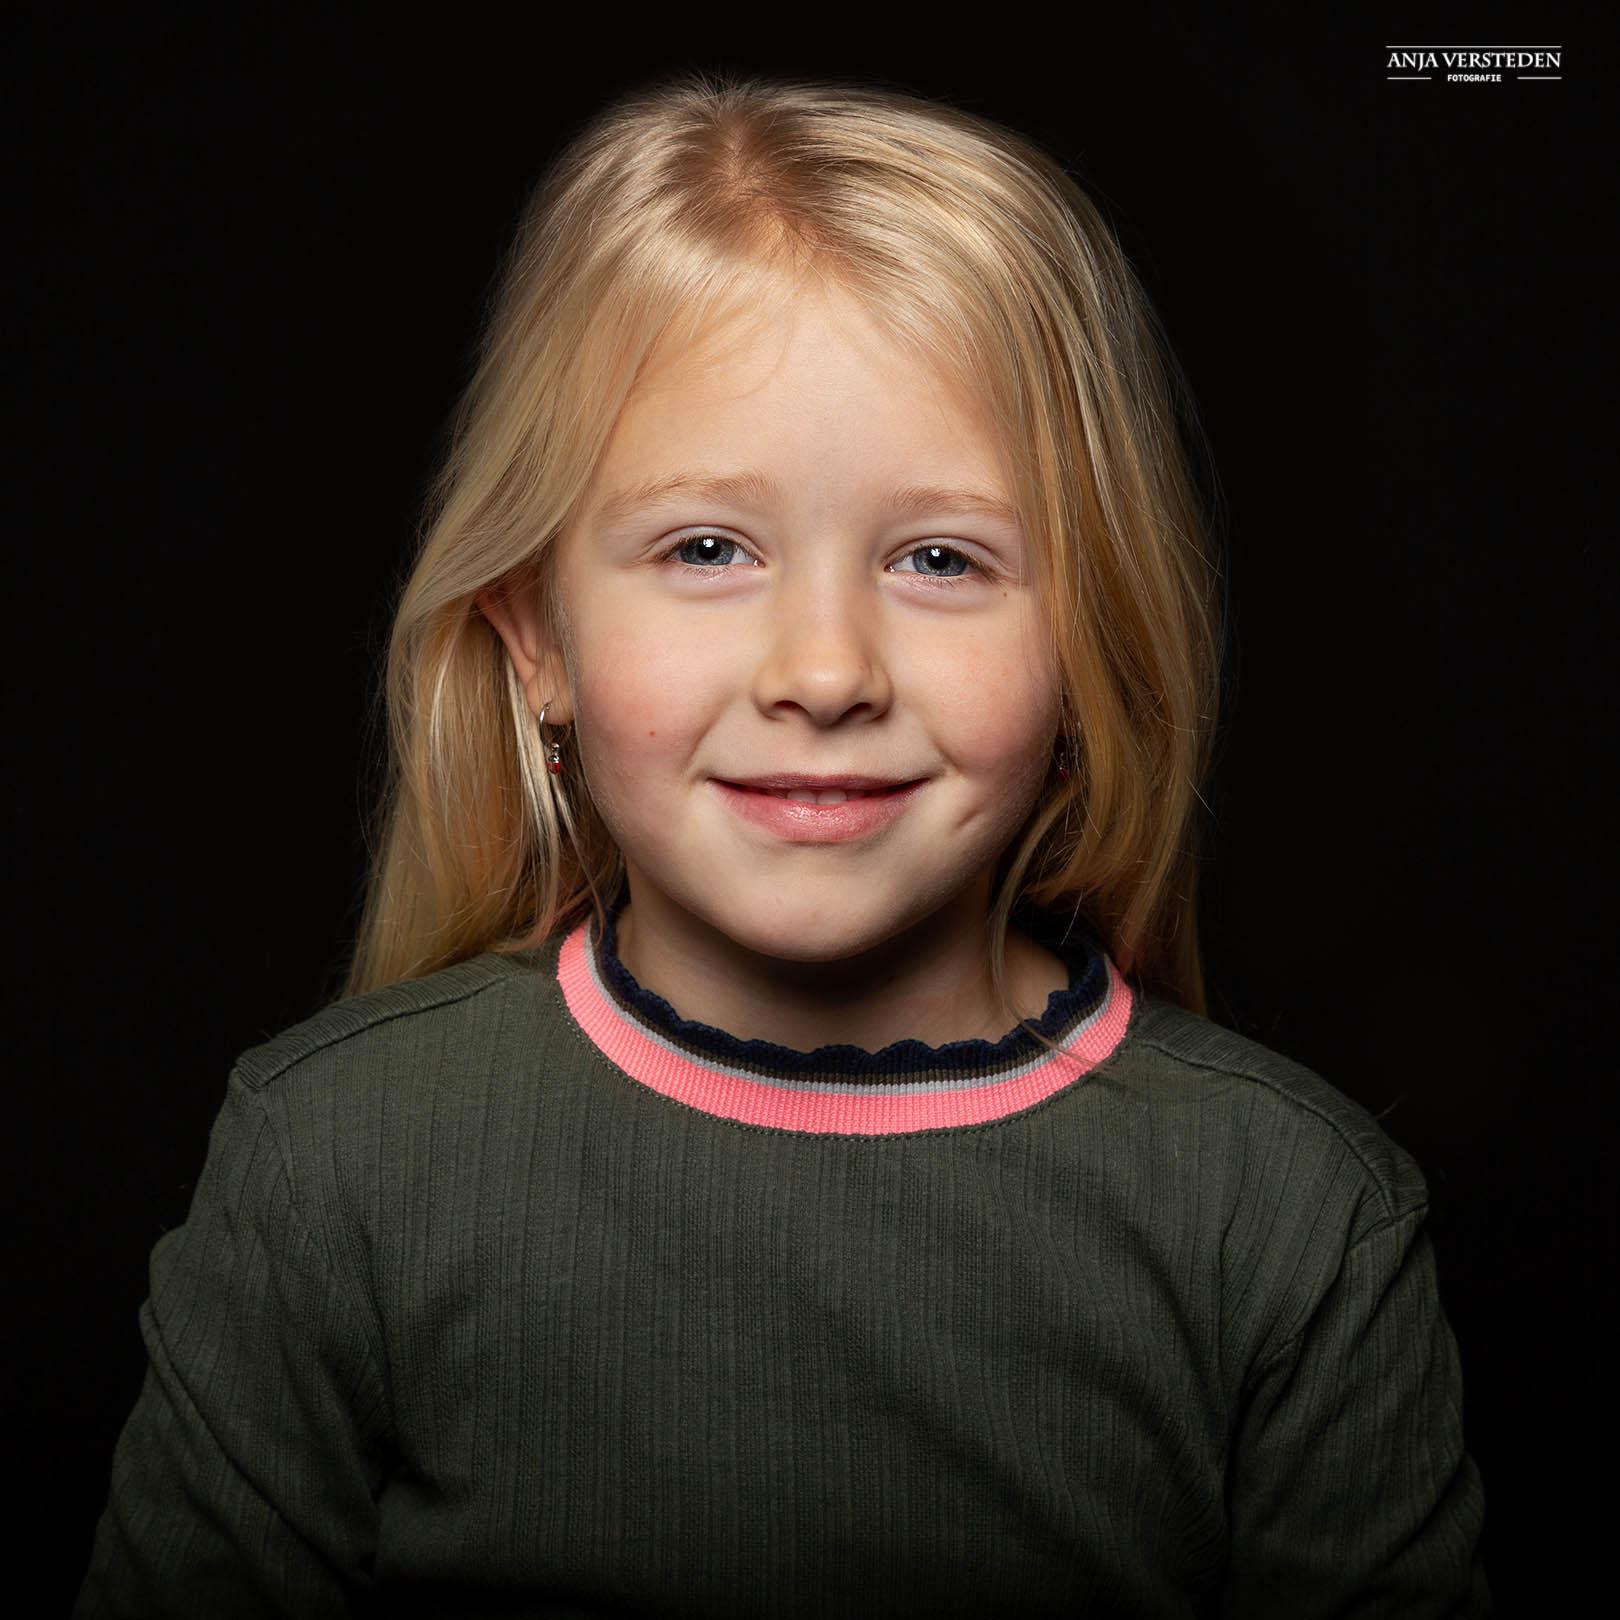 kinderportret   Kinderfotograaf